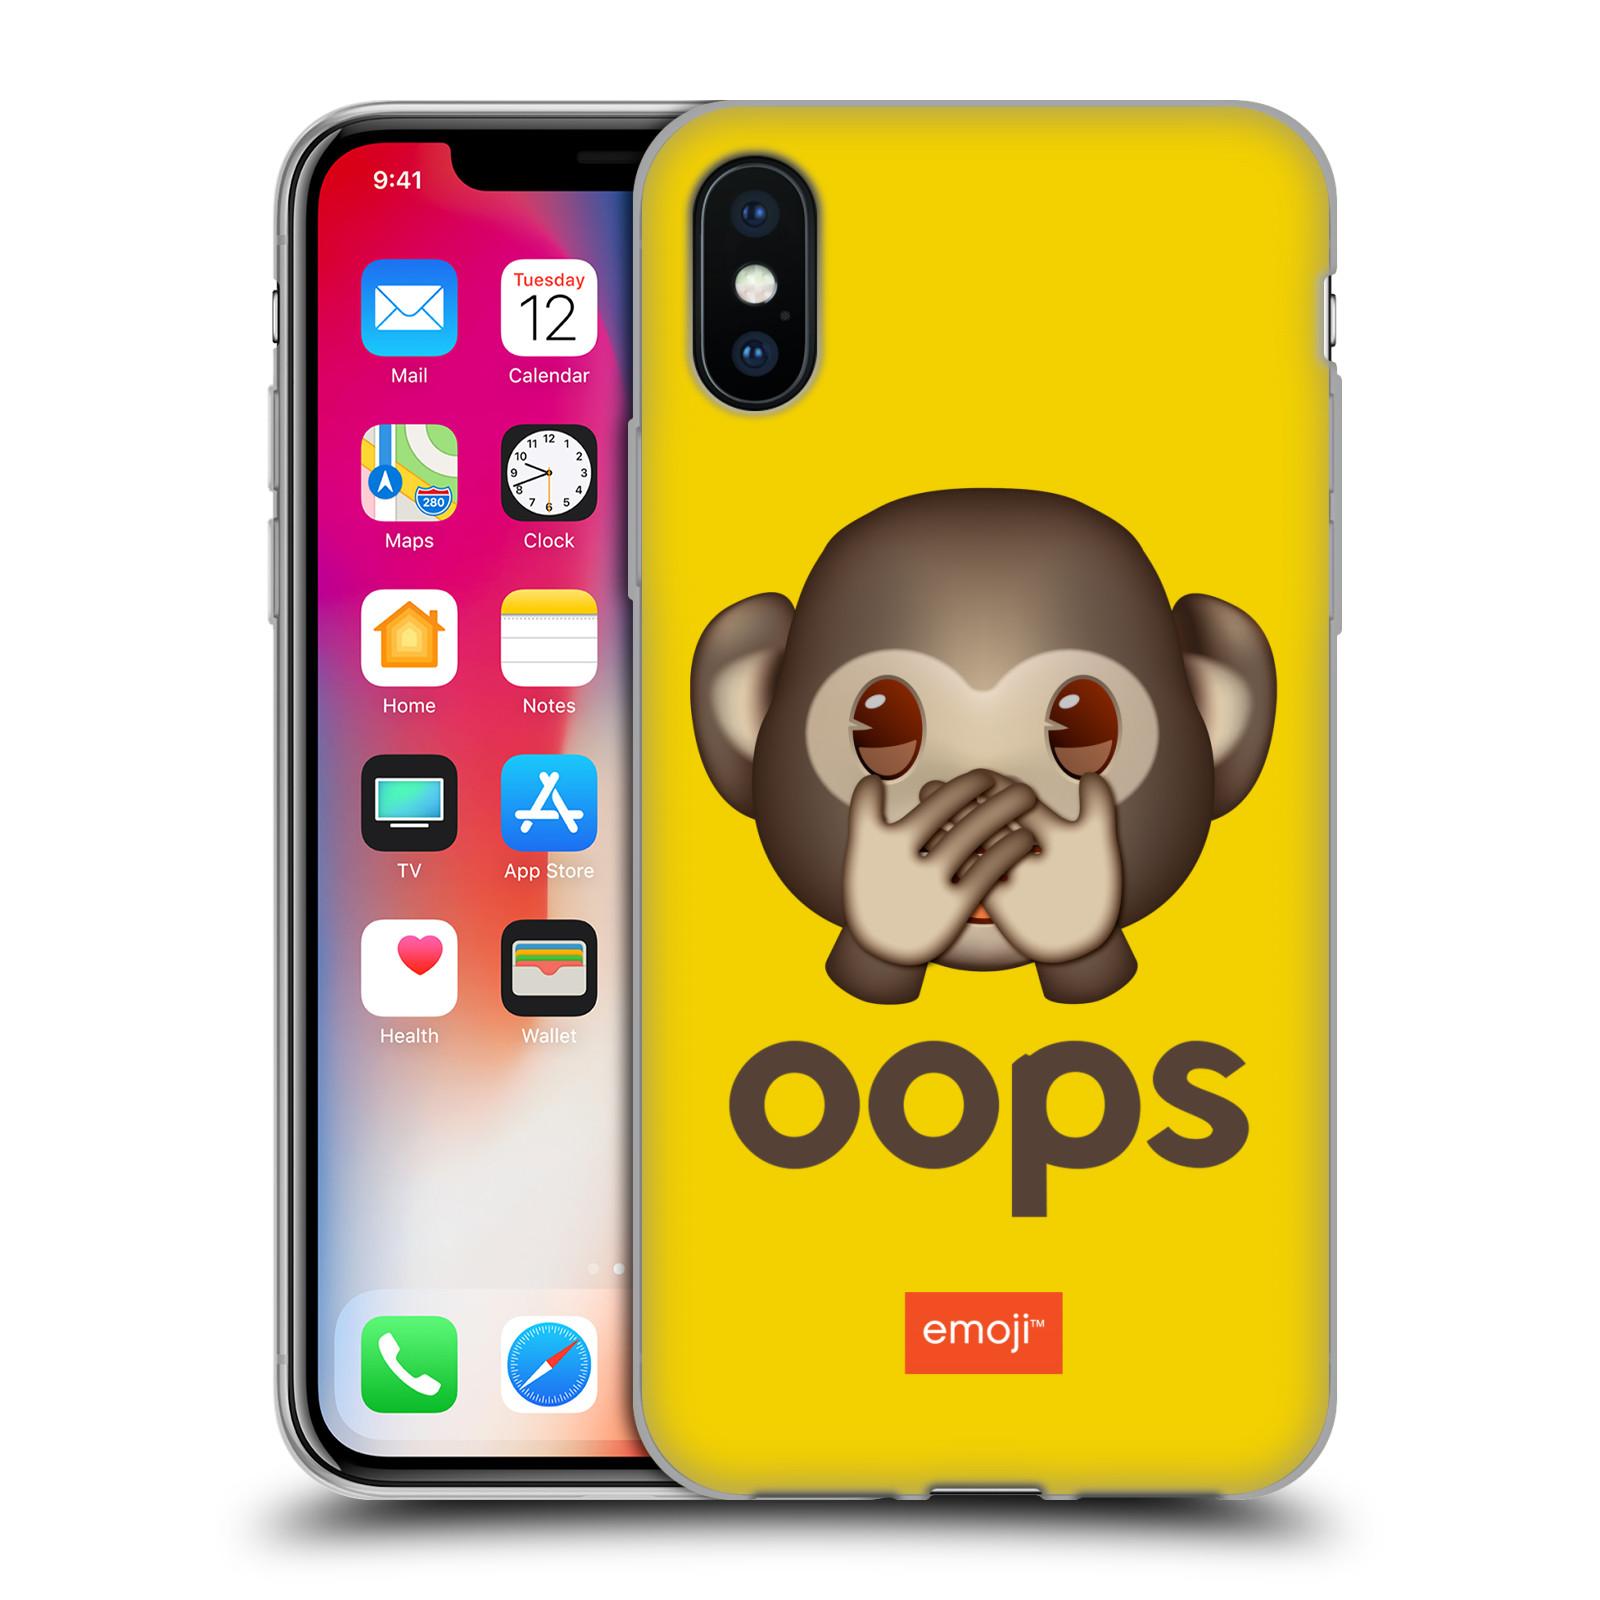 Silikonové pouzdro na mobil Apple iPhone XS - Head Case - EMOJI - Opička OOPS